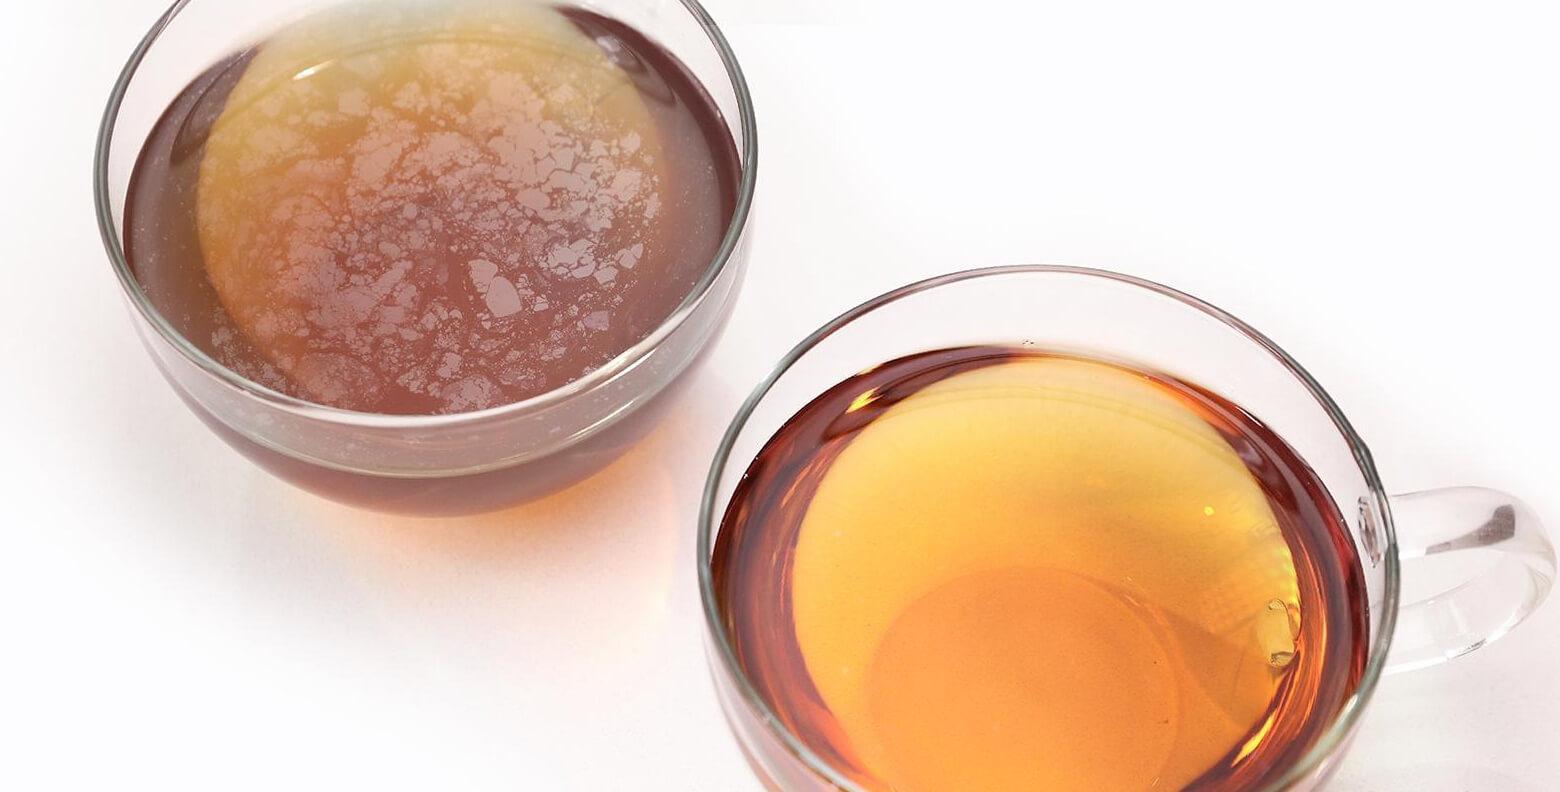 BRITA filtered water better tasting tea